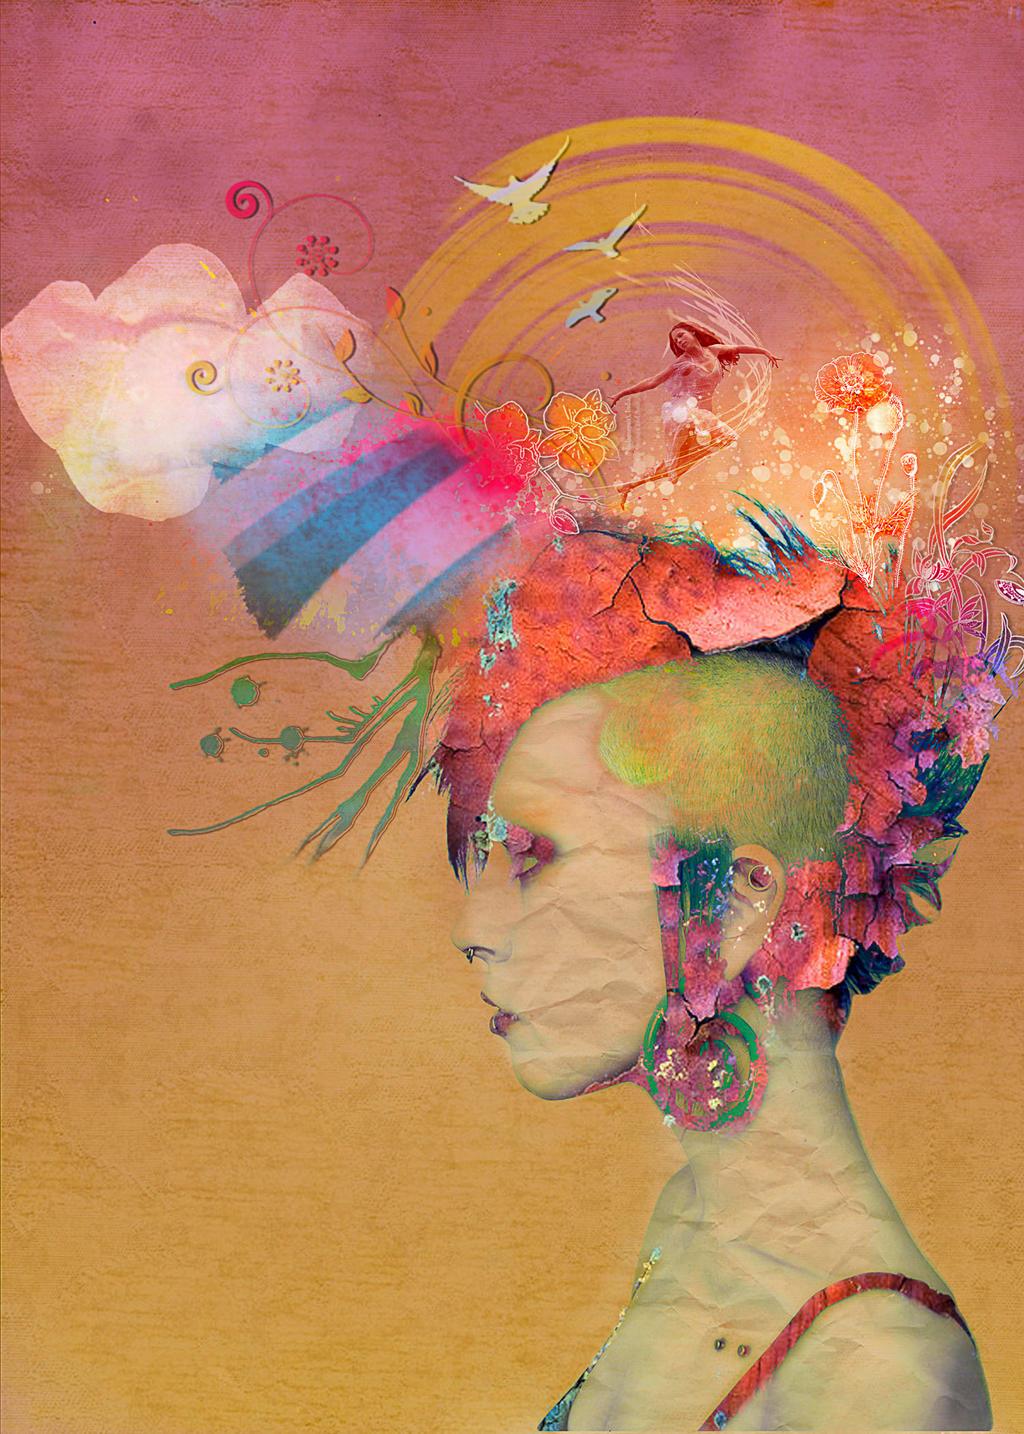 http://fc04.deviantart.net/fs70/i/2010/361/2/4/let_your_imagination_run_wild_by_angela_m_photography-d35ttkr.jpg